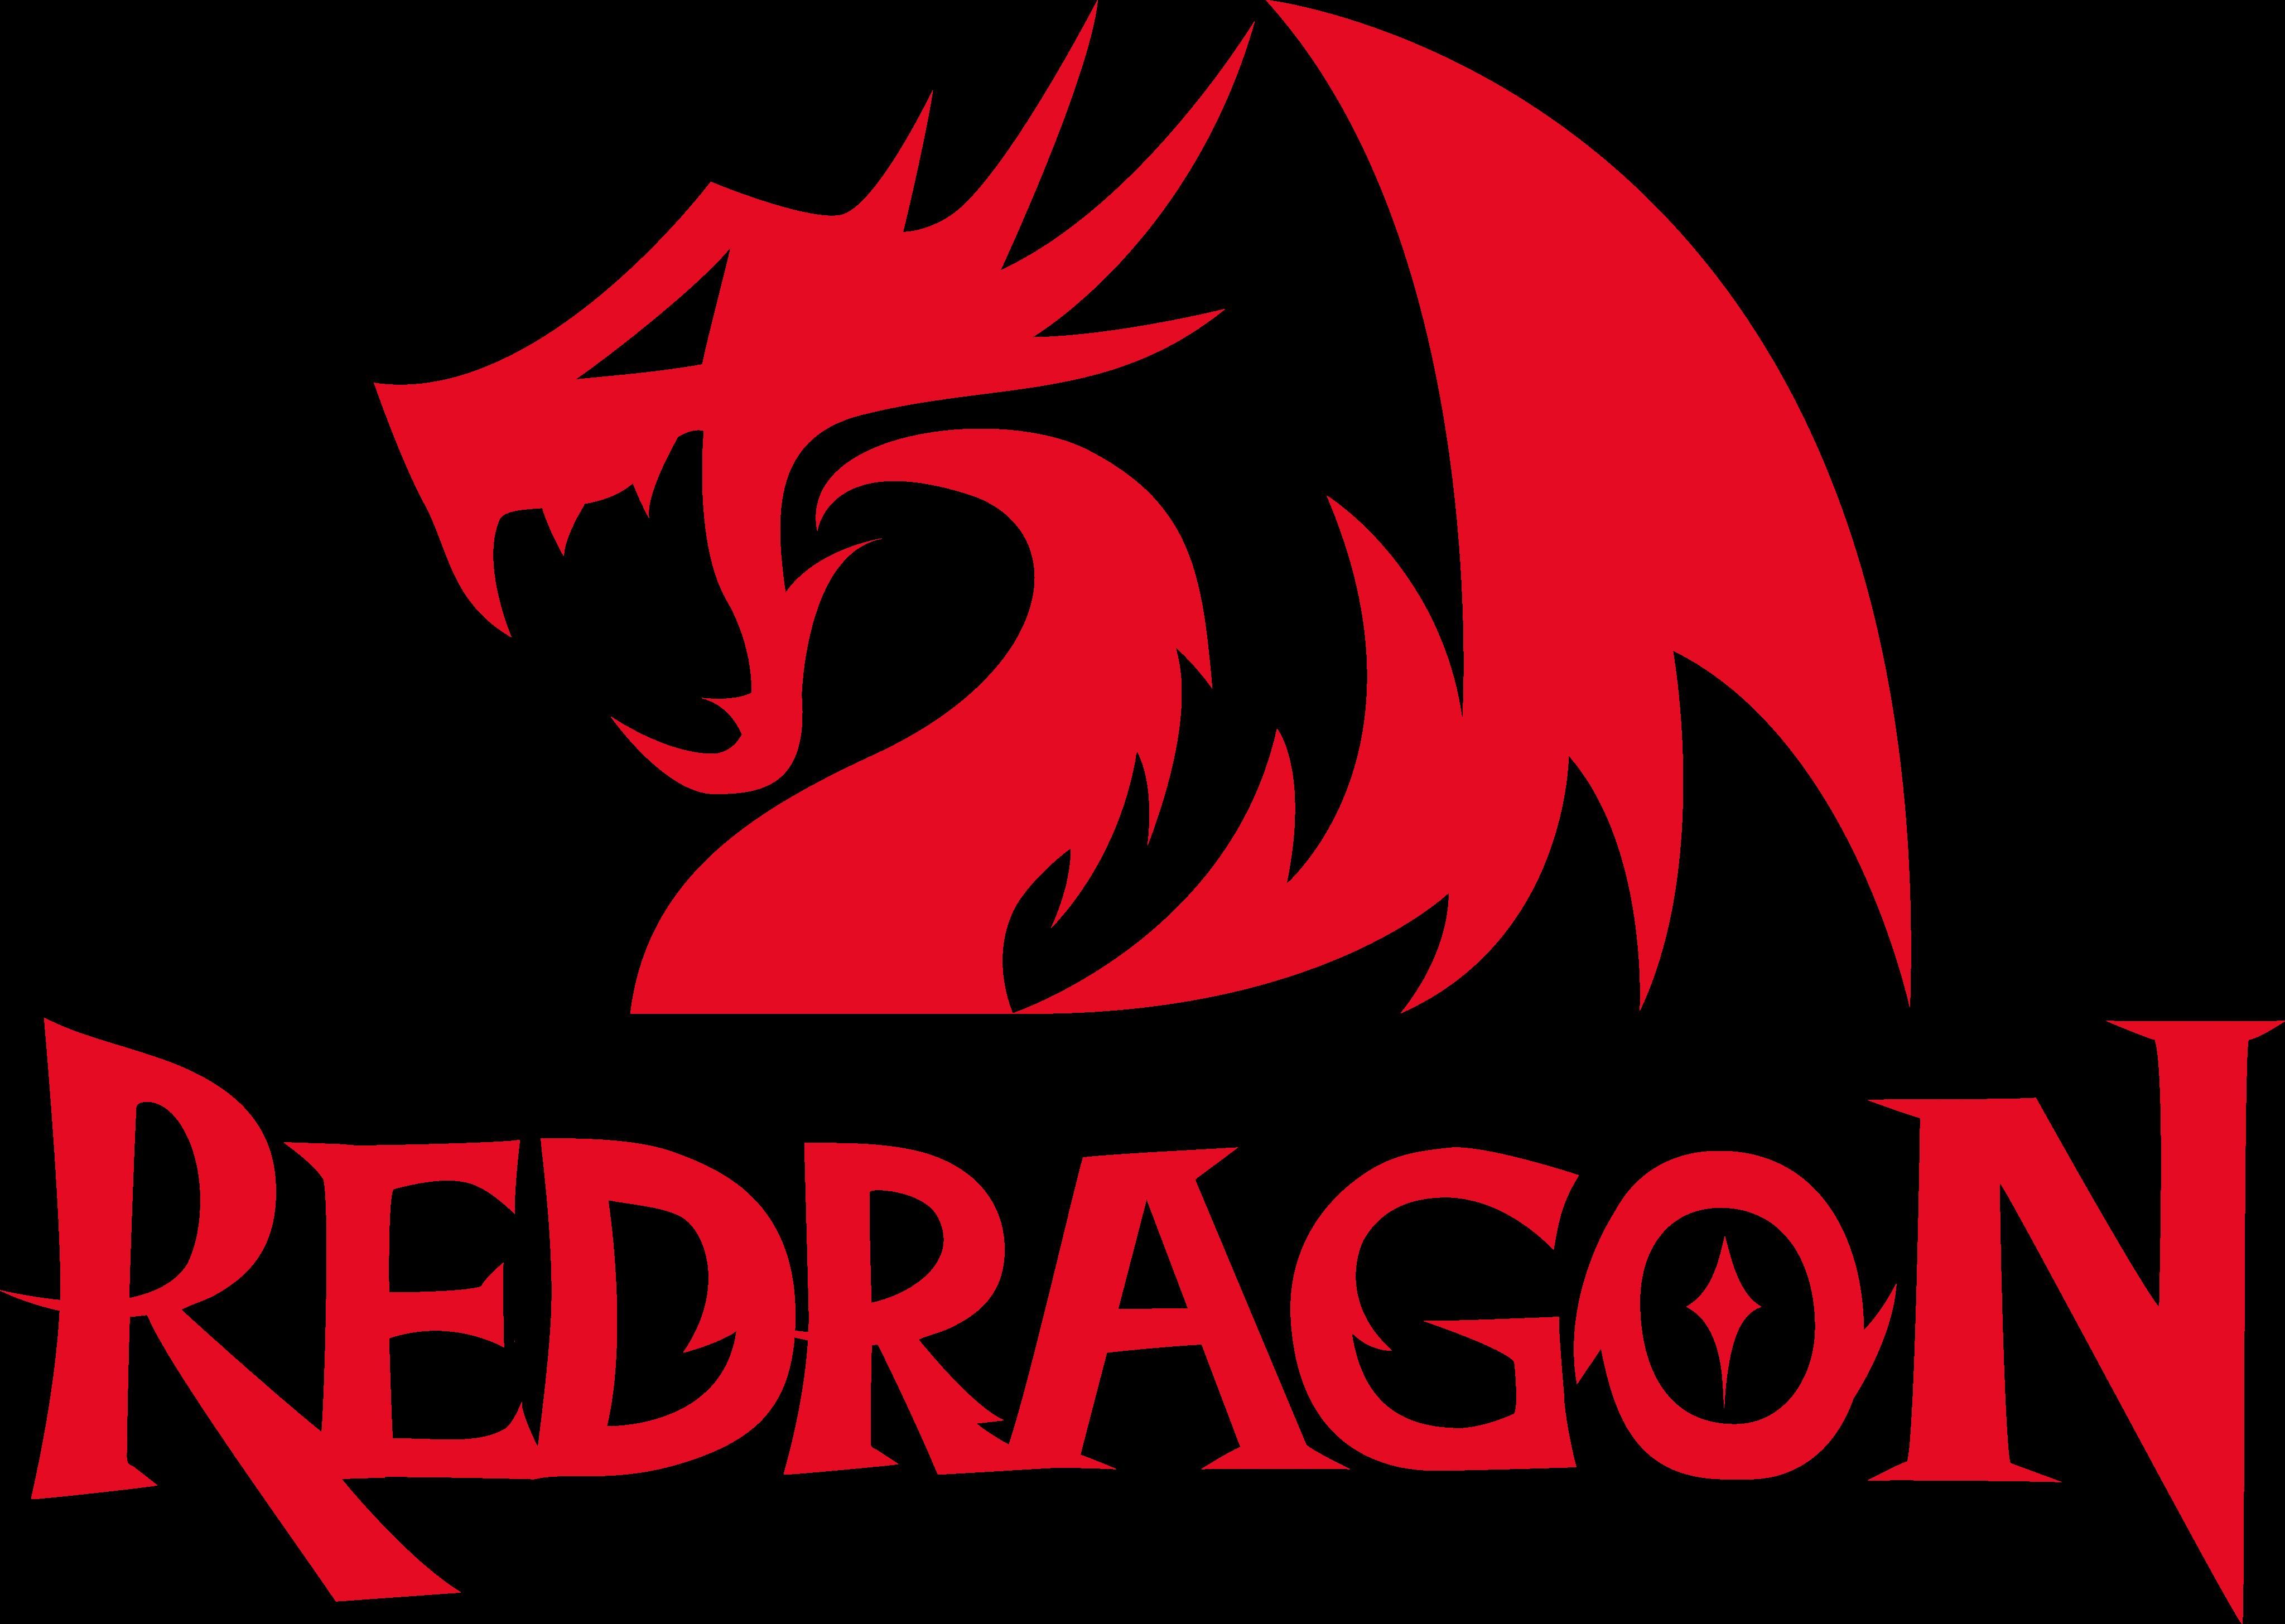 redragon logo 1 - Redragon Logo